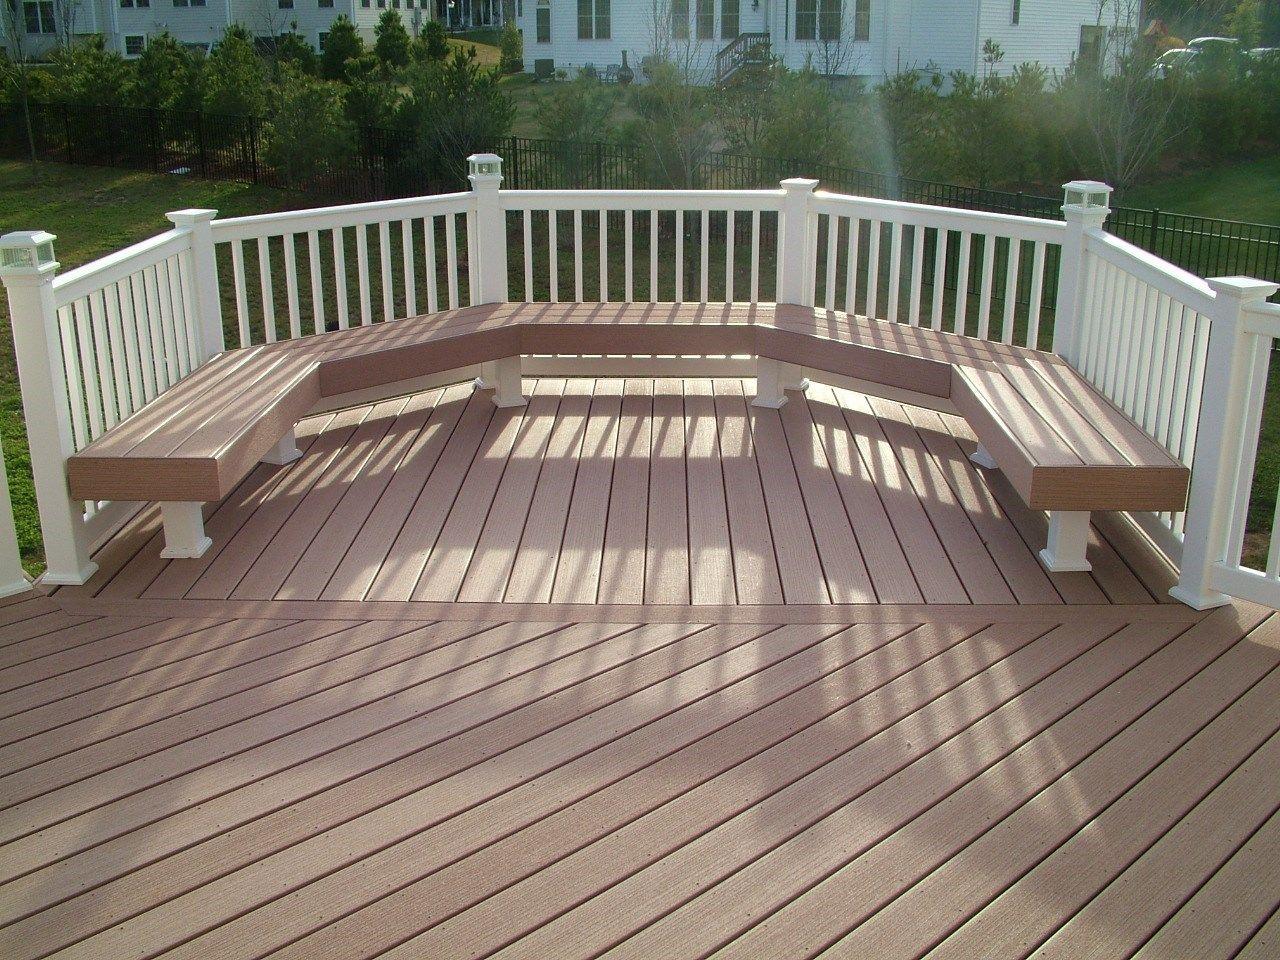 Custom Deck in Morganville N.J. - Picture 3359